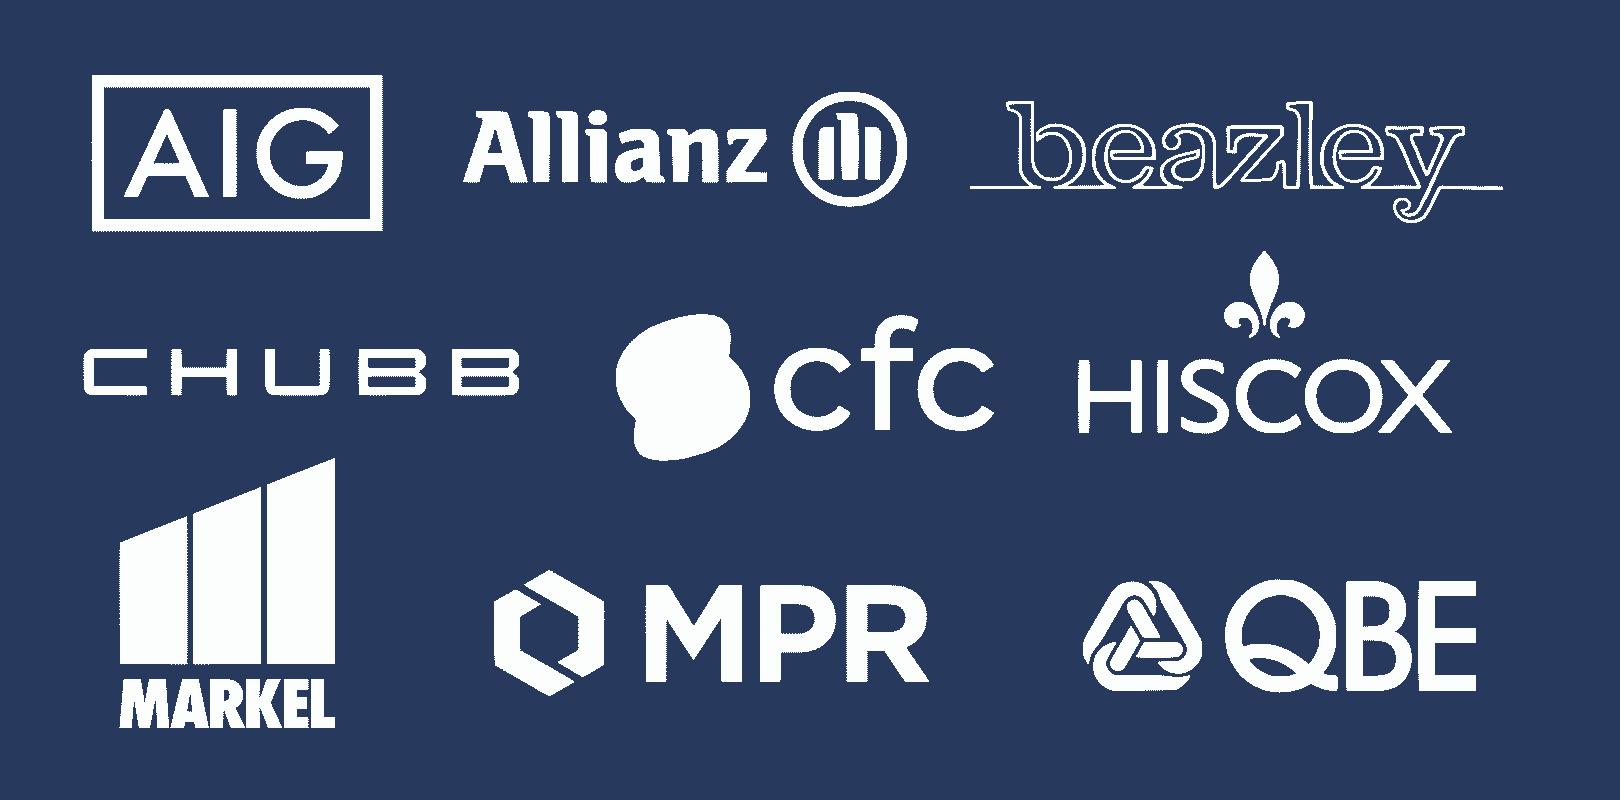 Leading cyber insurance providers include: AIG, Allianz, Beazley, Chubb, CFC, Hiscox, Markel, MPR, and QBE.